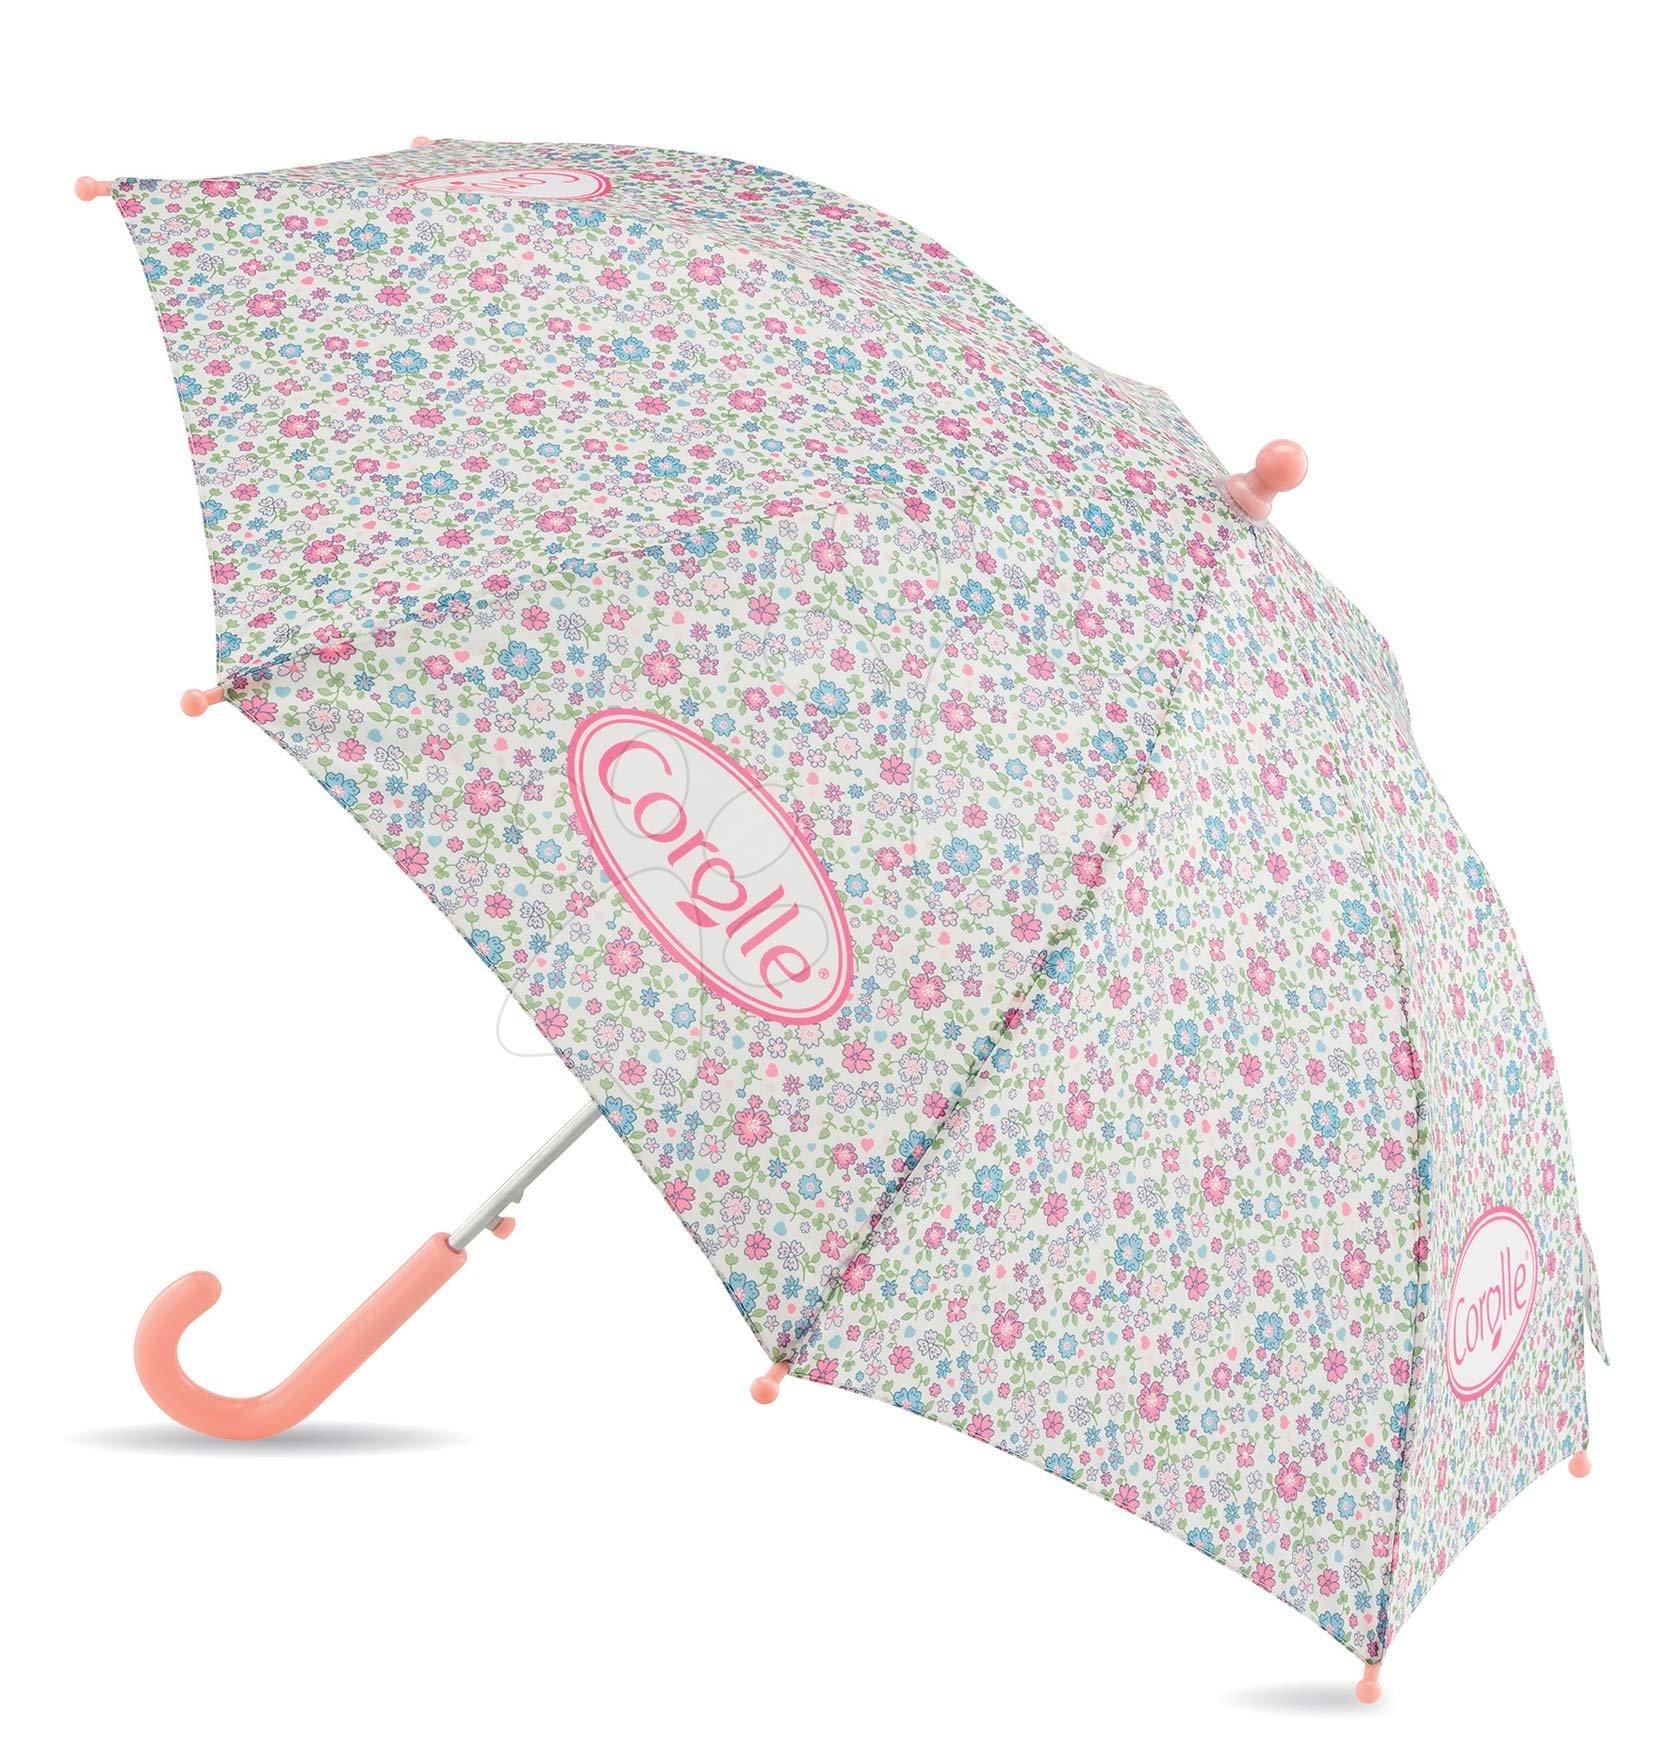 Školske torbe i ruksaci - Kišobran na cvjetiće Flowers Umbrella Les Bagages Corolle 62 cm ručka i 83 cm promjer